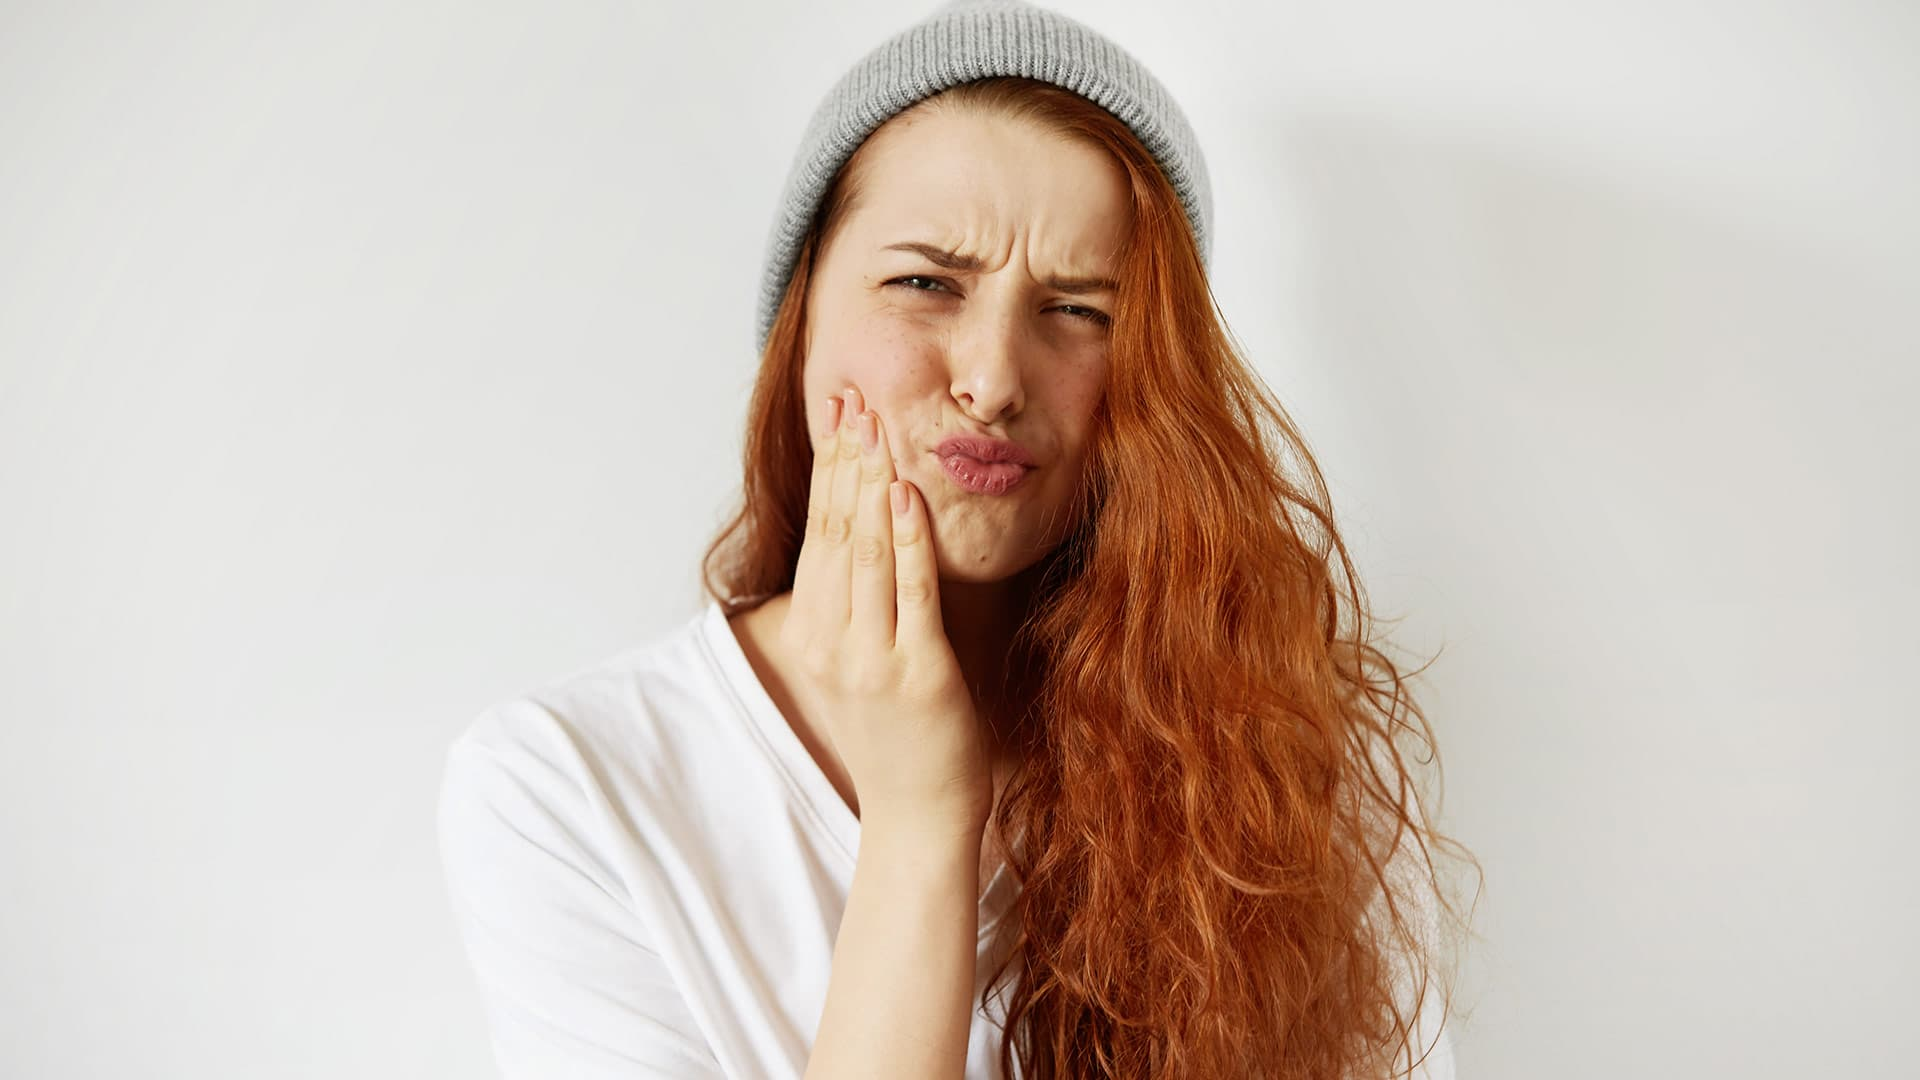 AUA IN HAMBURG Zahnarzt Angstpatient Füllung Zahnreinigung Prophylaxe